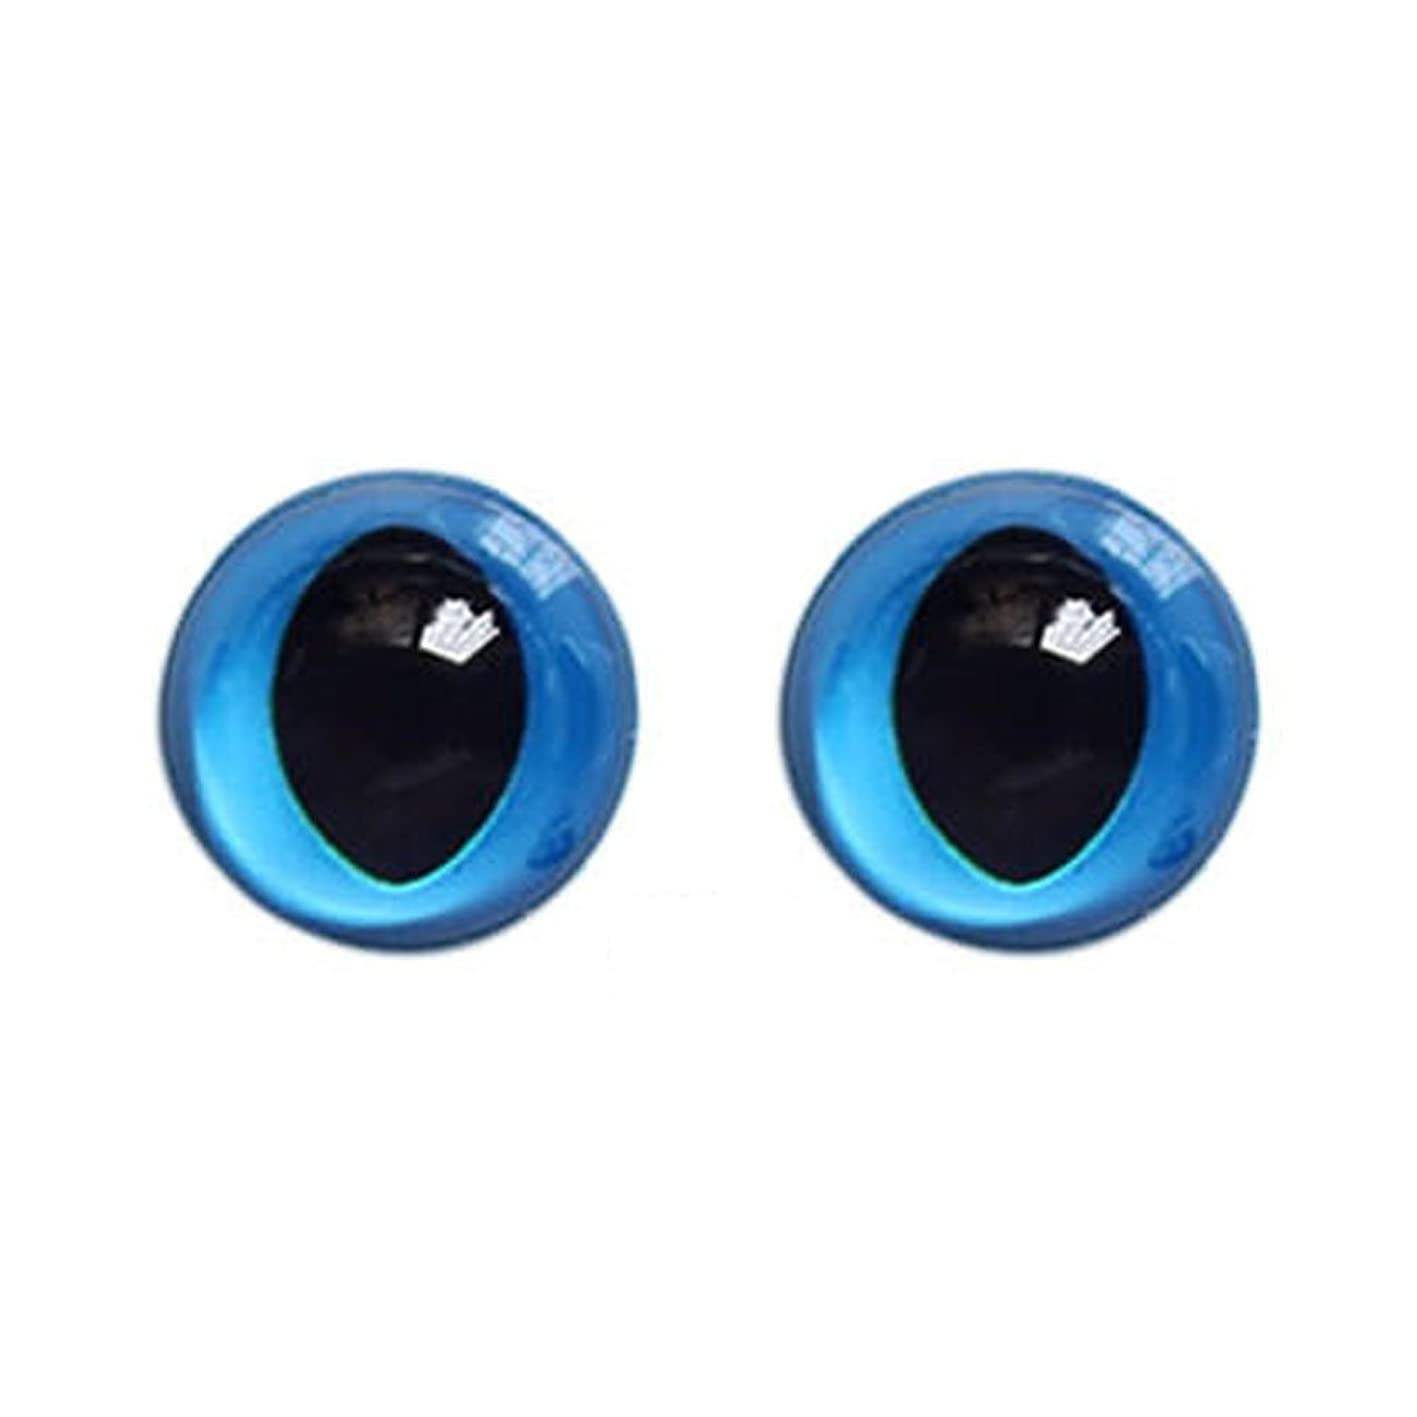 Inlefen Handmade Plastic Animal's Eye Cute Toy DIY Accessories Blue Series jagrtwwssdi417